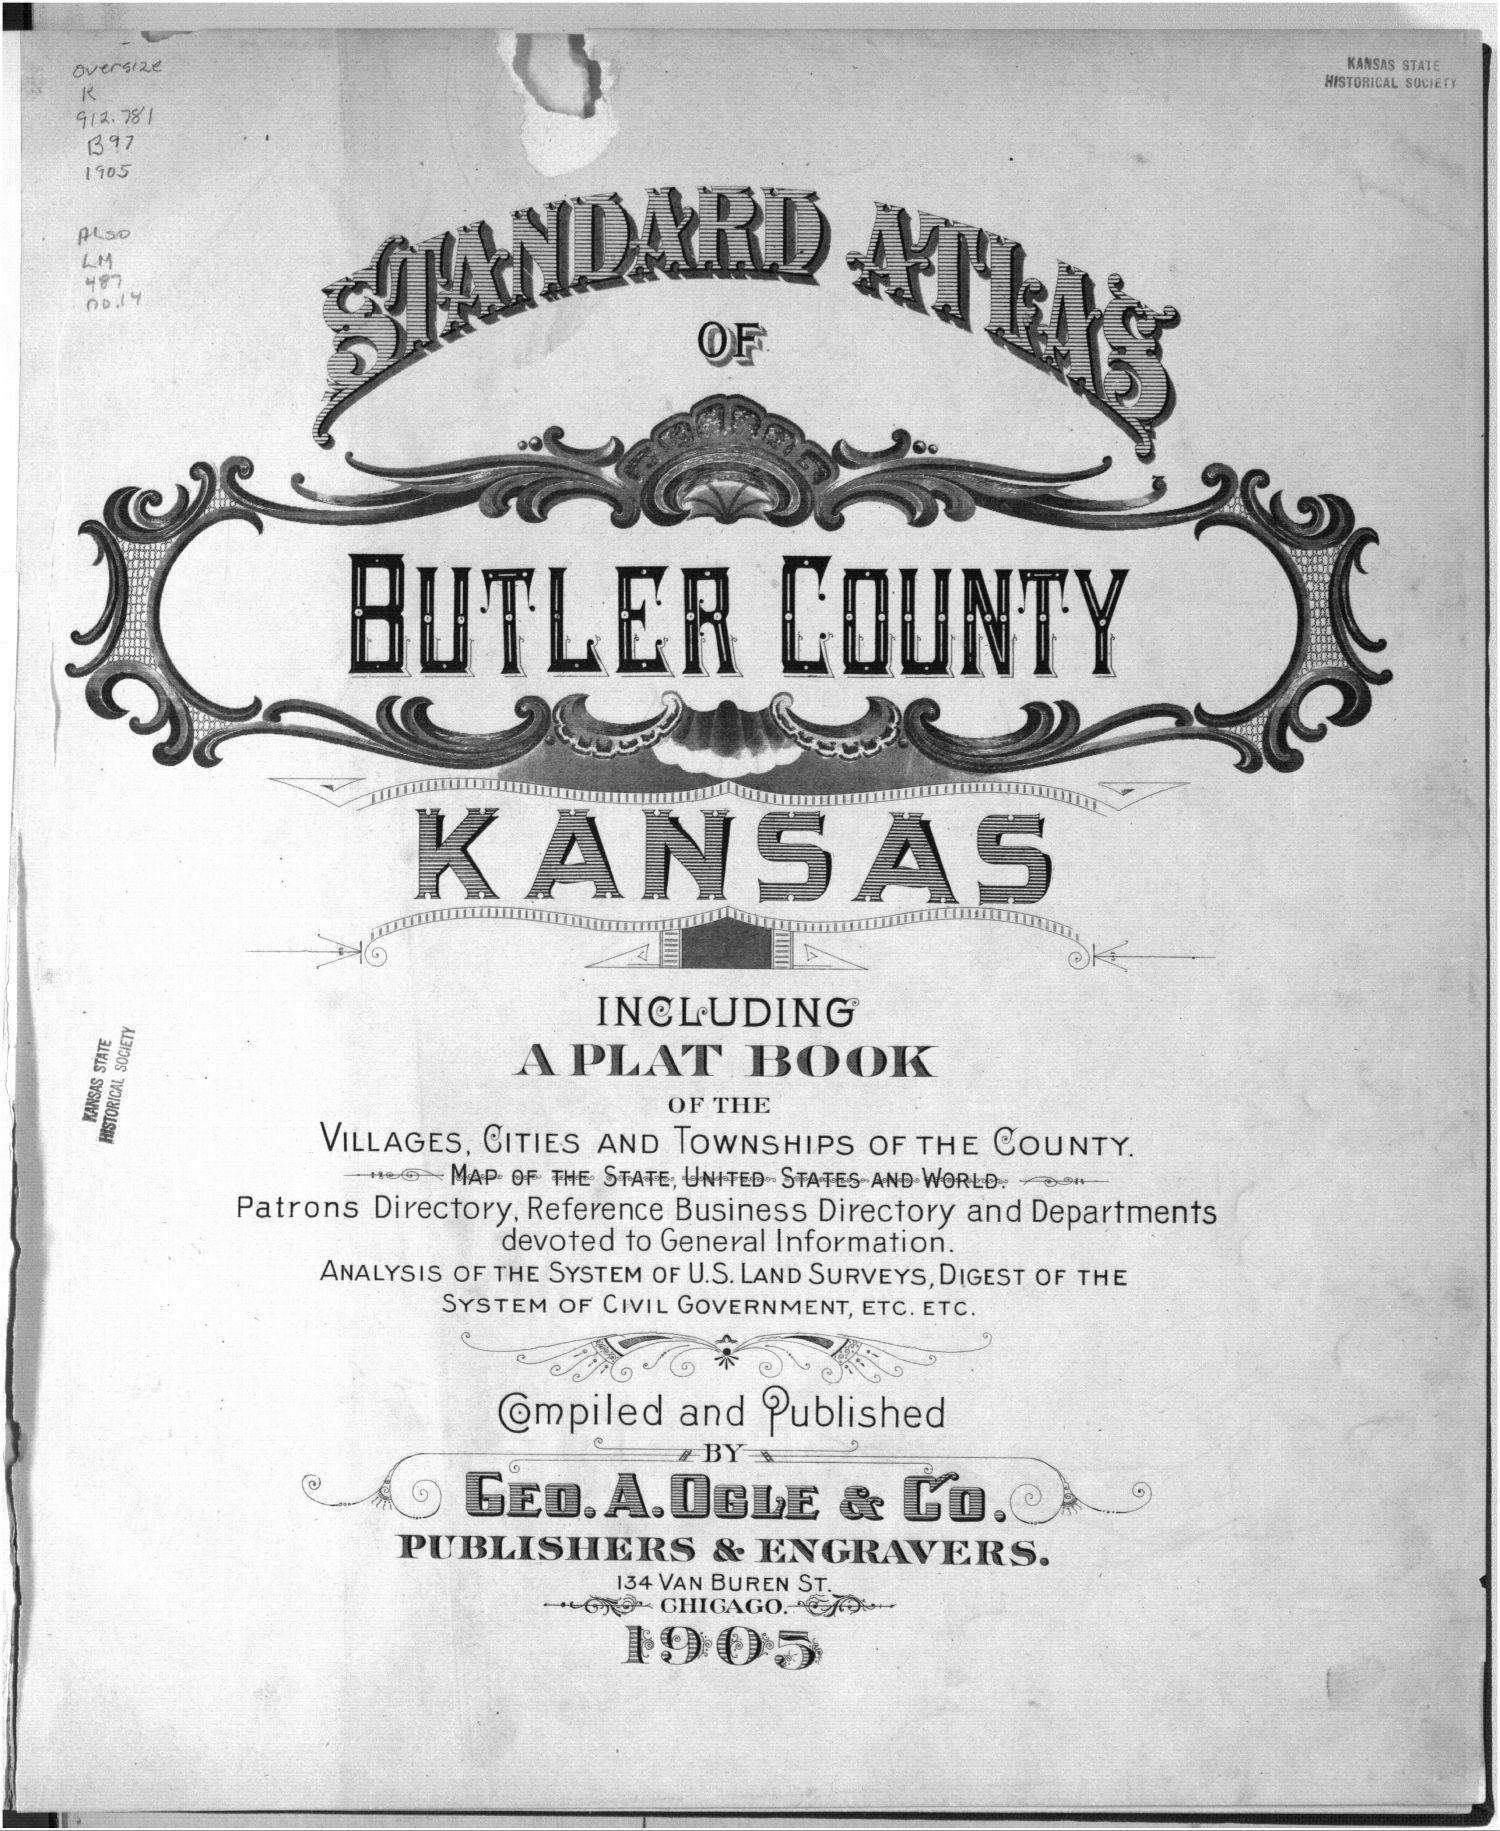 Standard atlas of Butler County, Kansas - 25